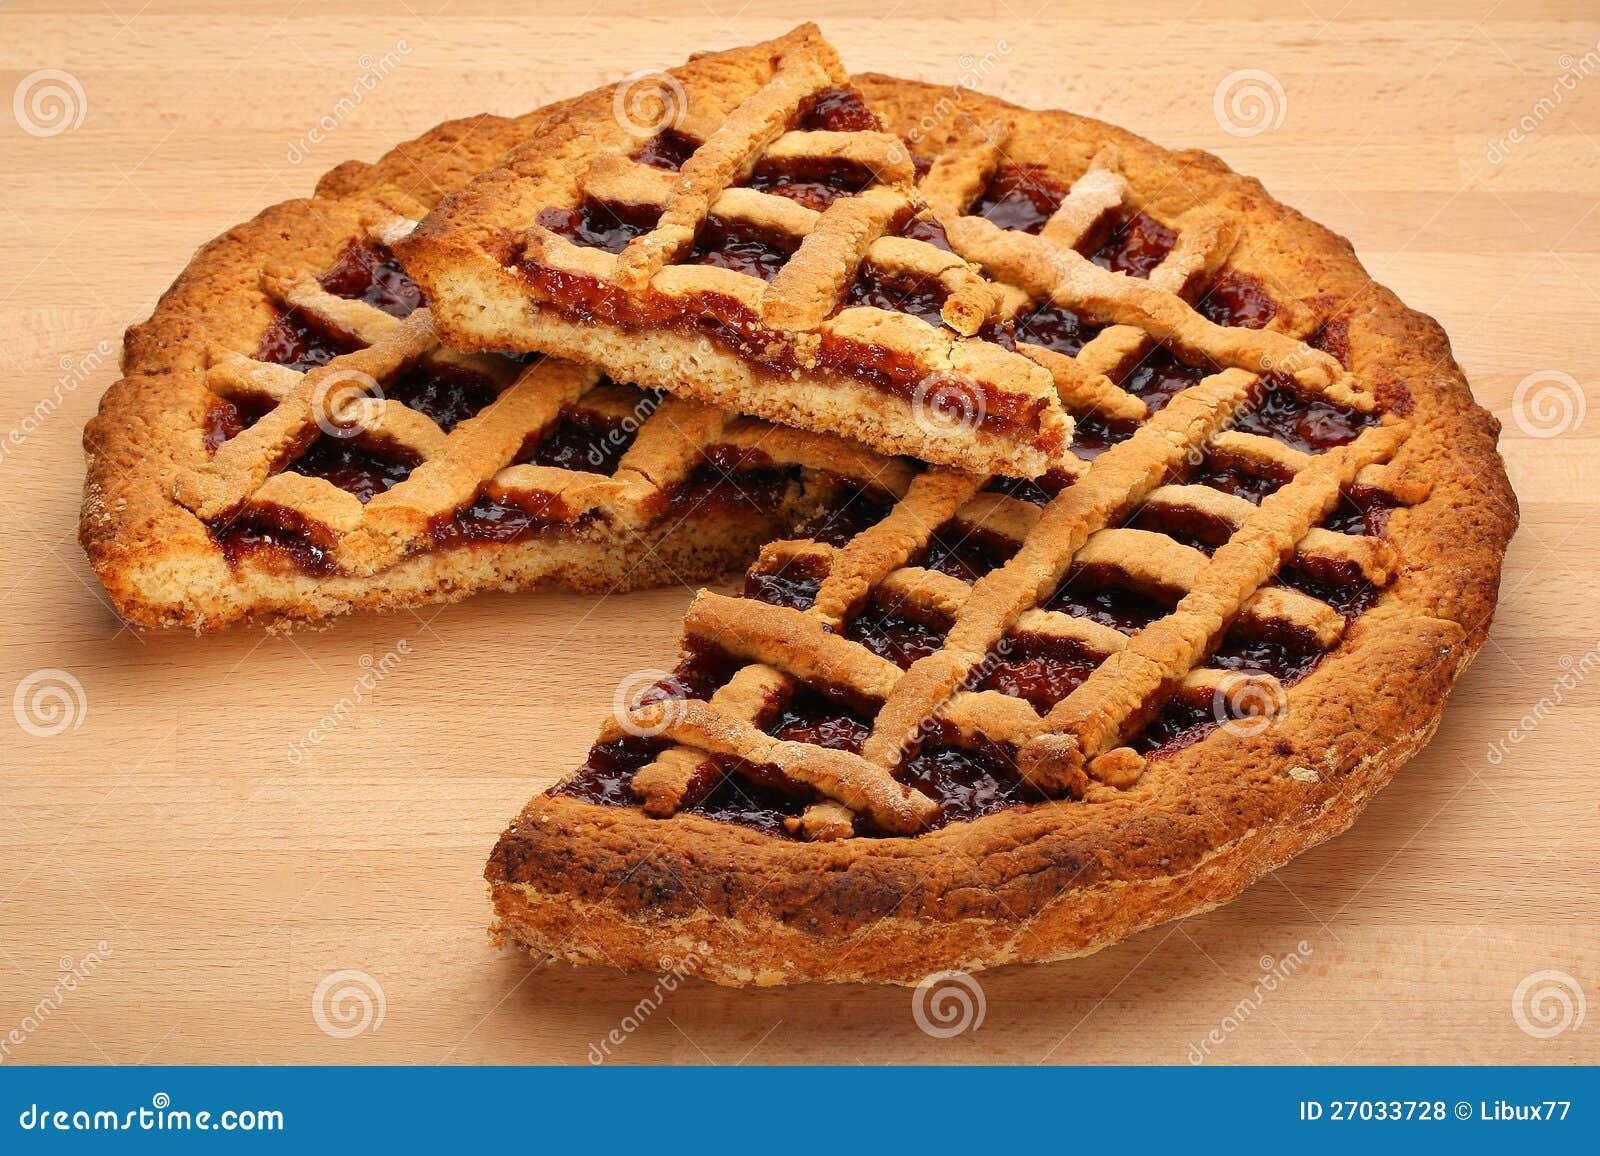 Strawberry Jam Tart Stock Photo Image Of Bake Aerial